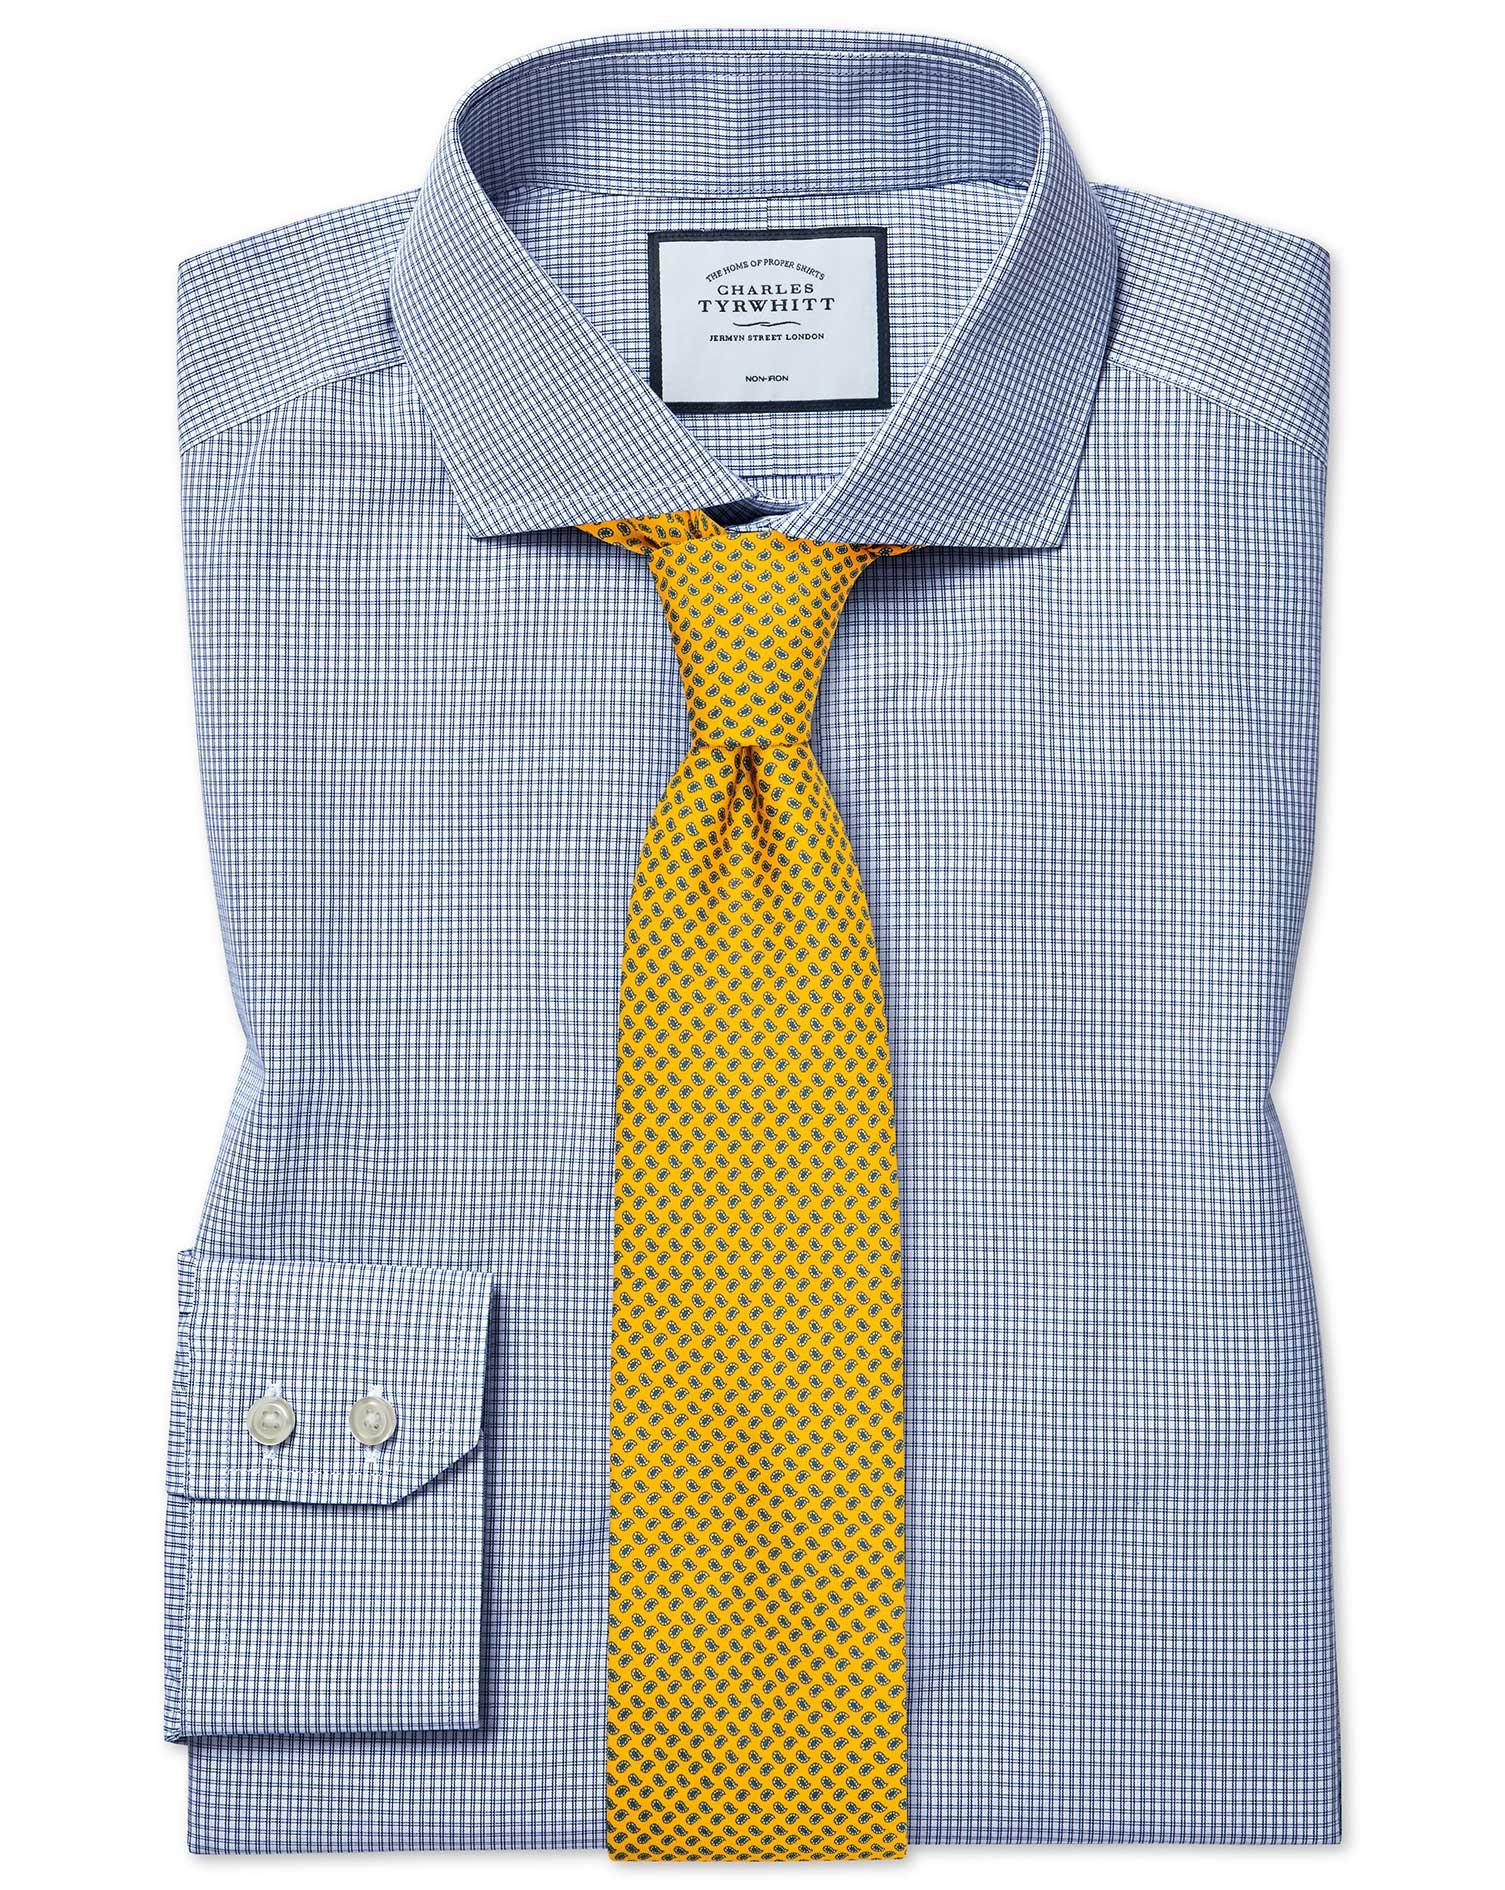 Cotton Extra Slim Fit Non-Iron Cutaway Tyrwhitt Cool Poplin Check Blue Shirt